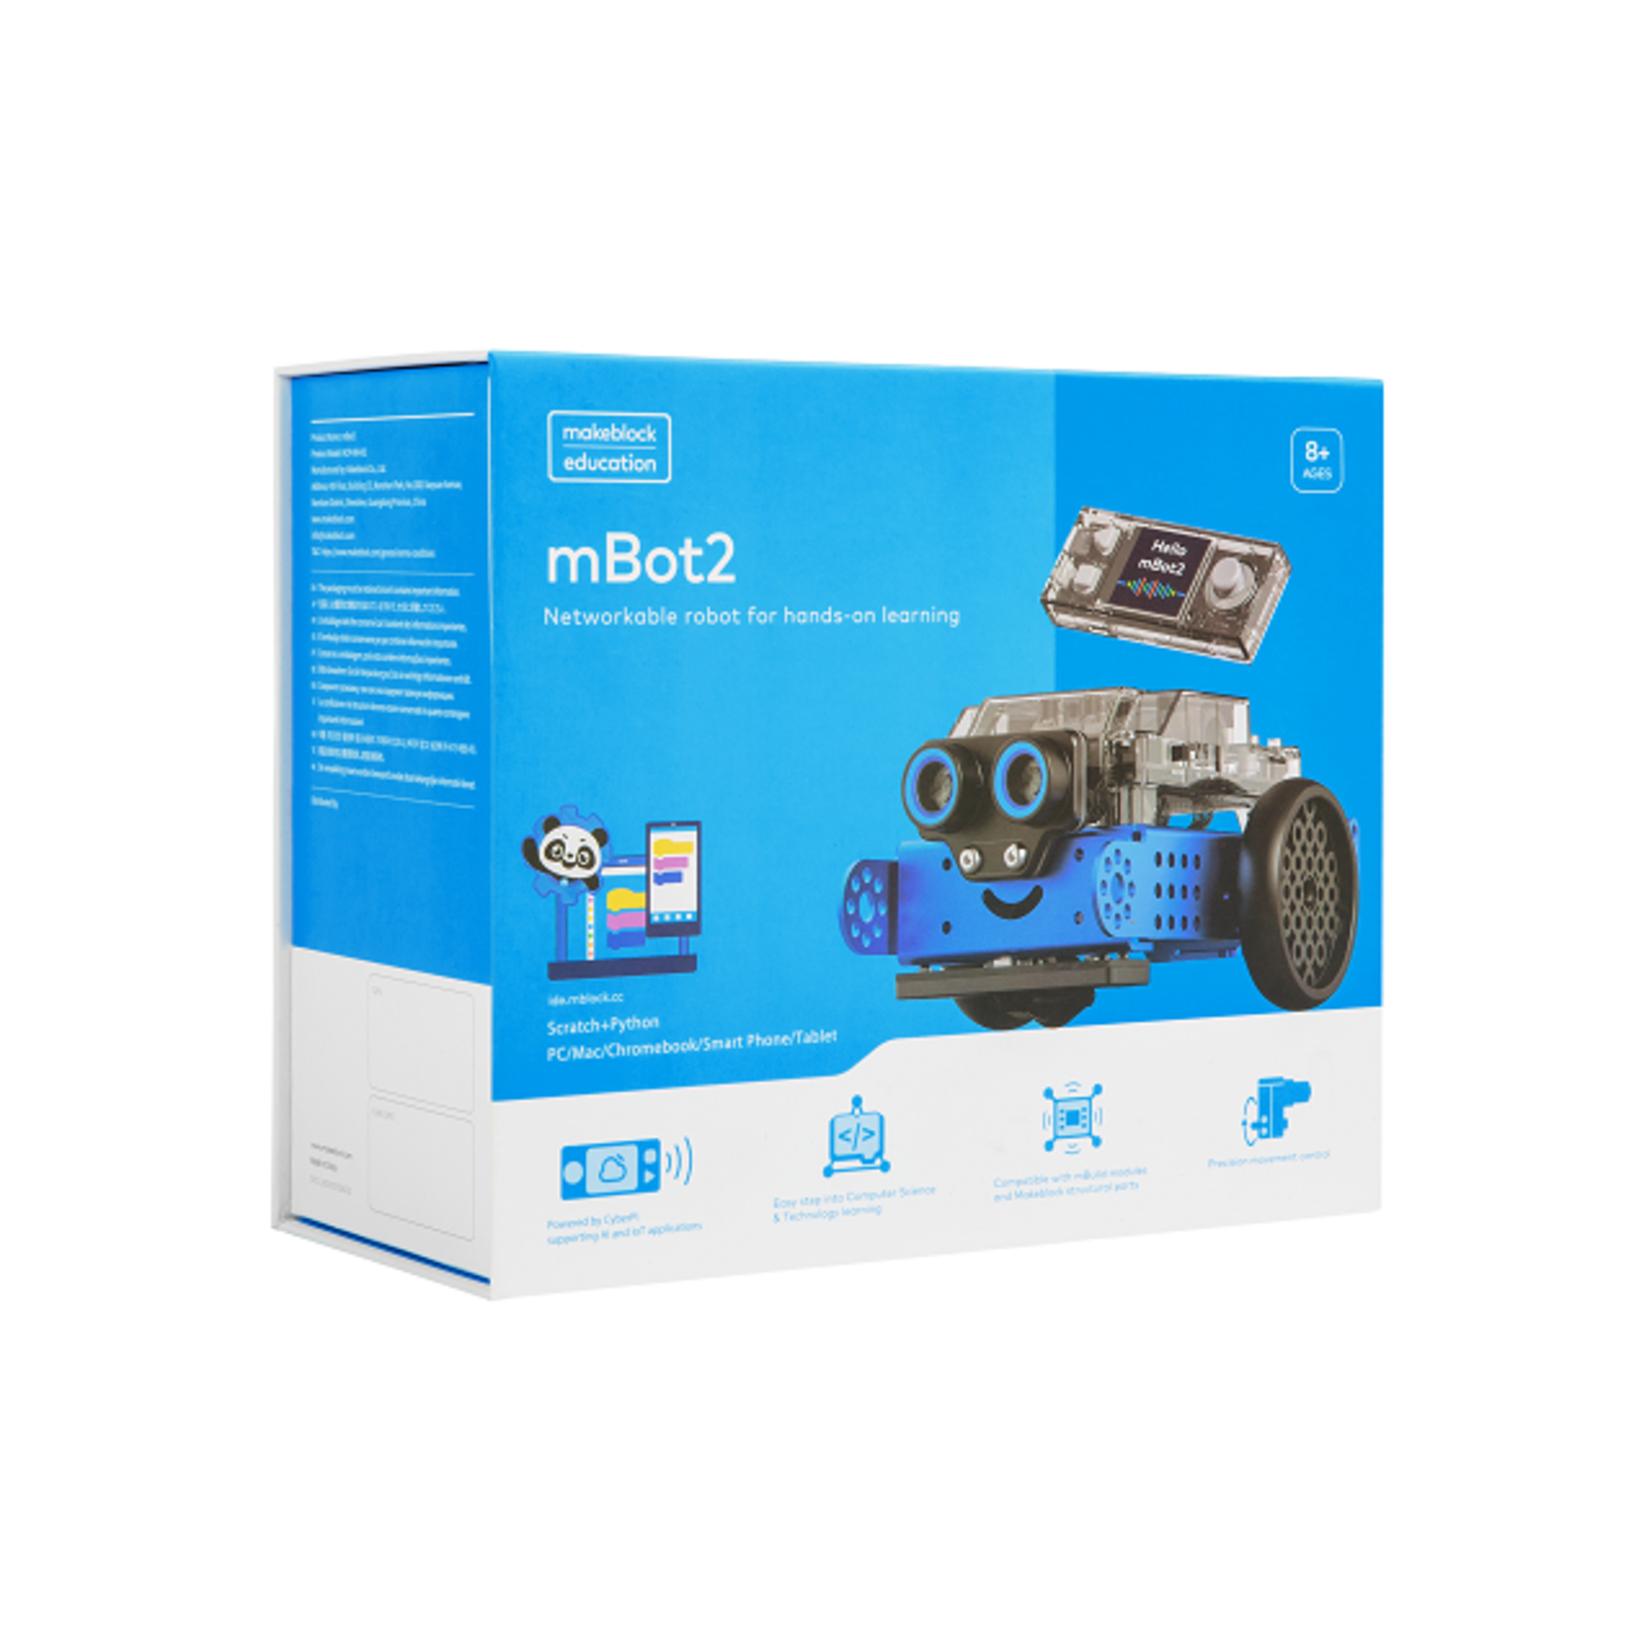 makeblock mBot2